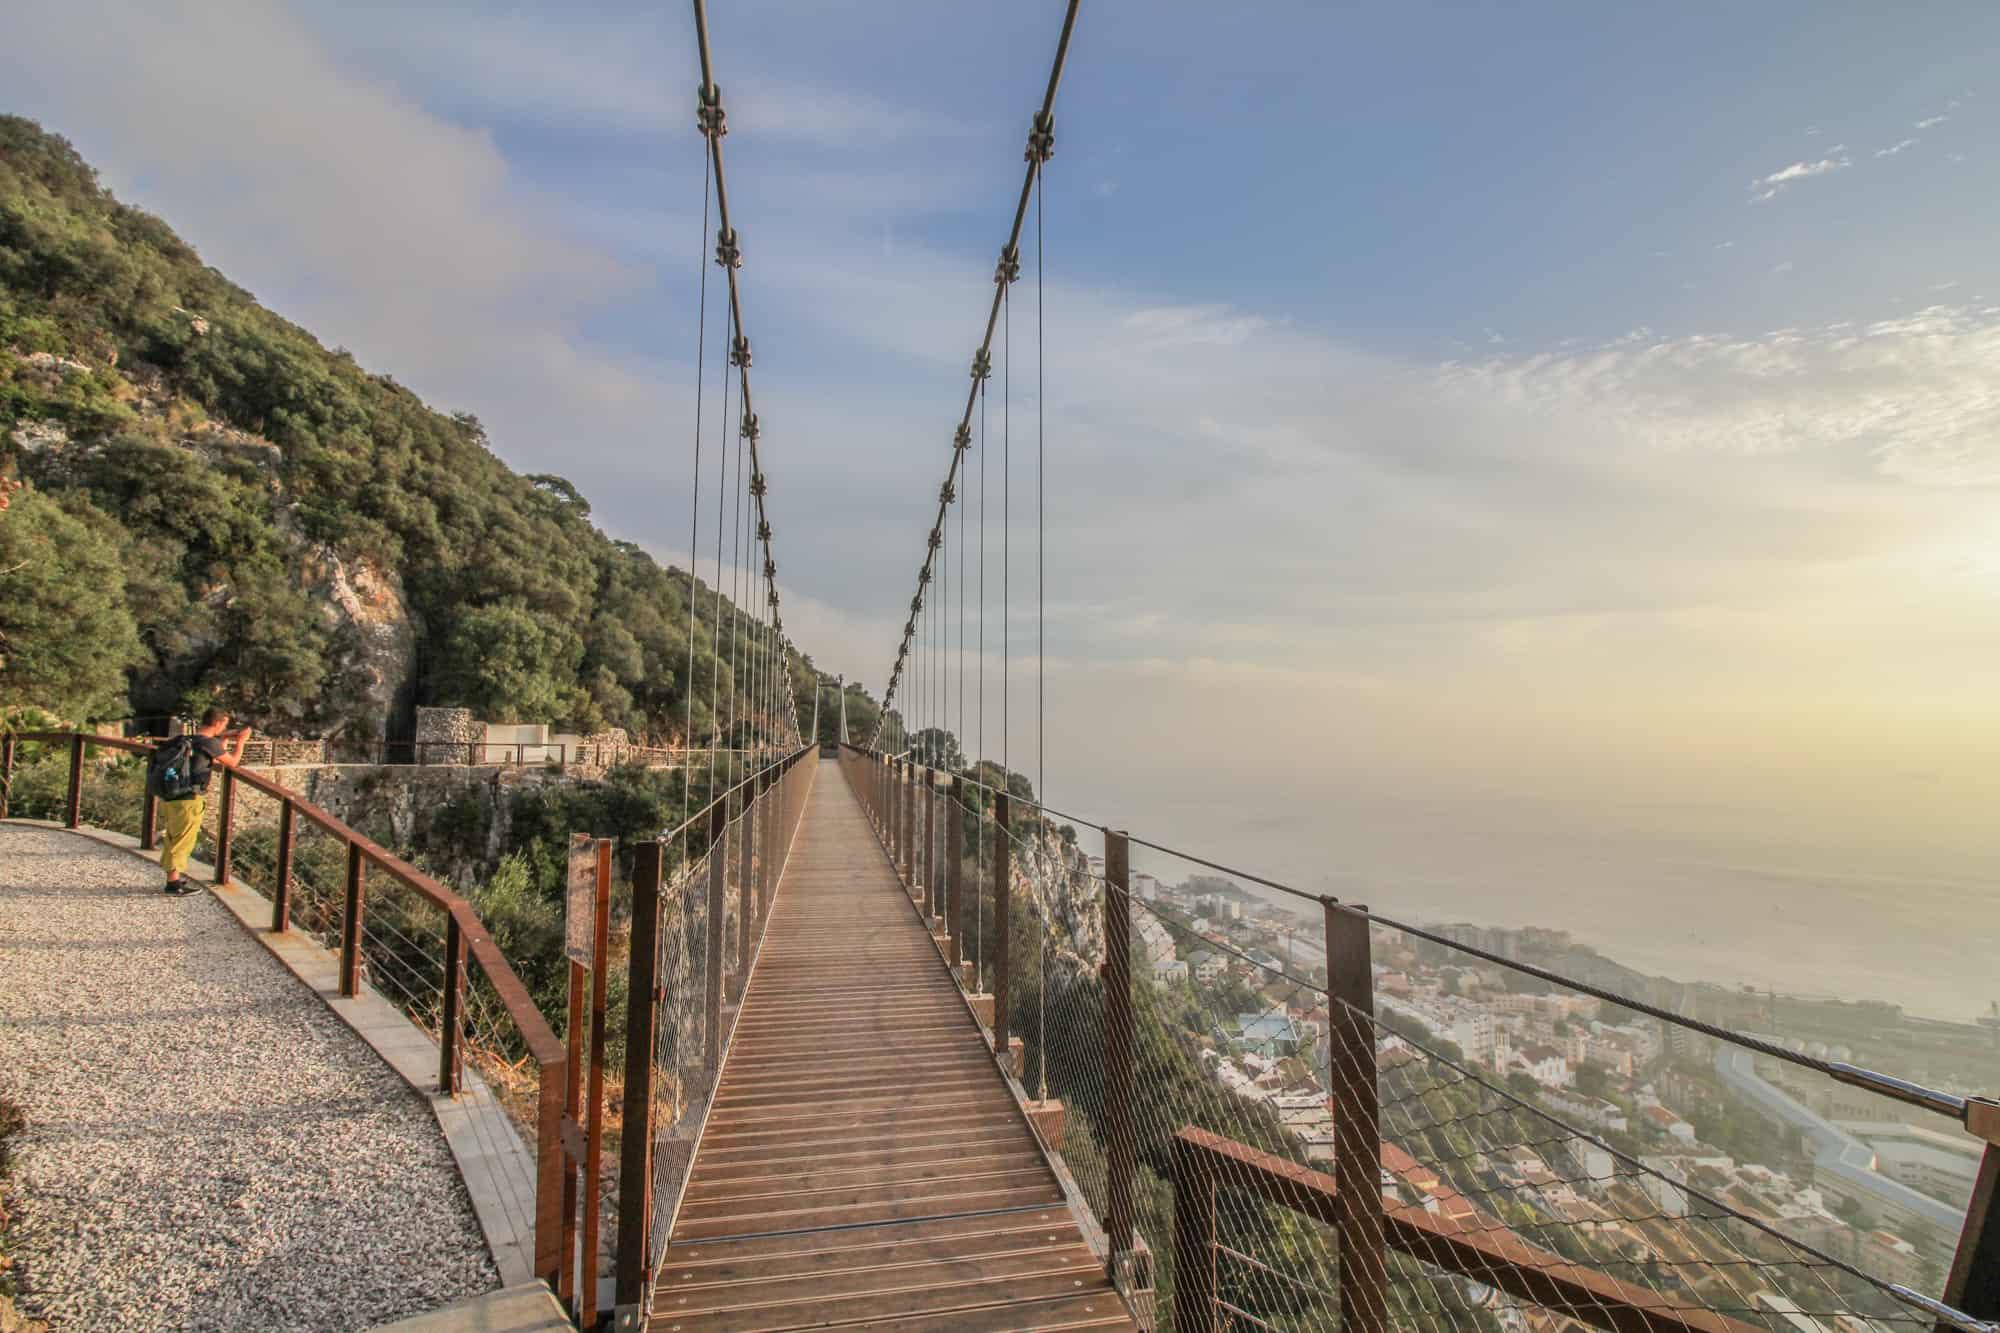 Hängebrücke Rock of Gibraltar